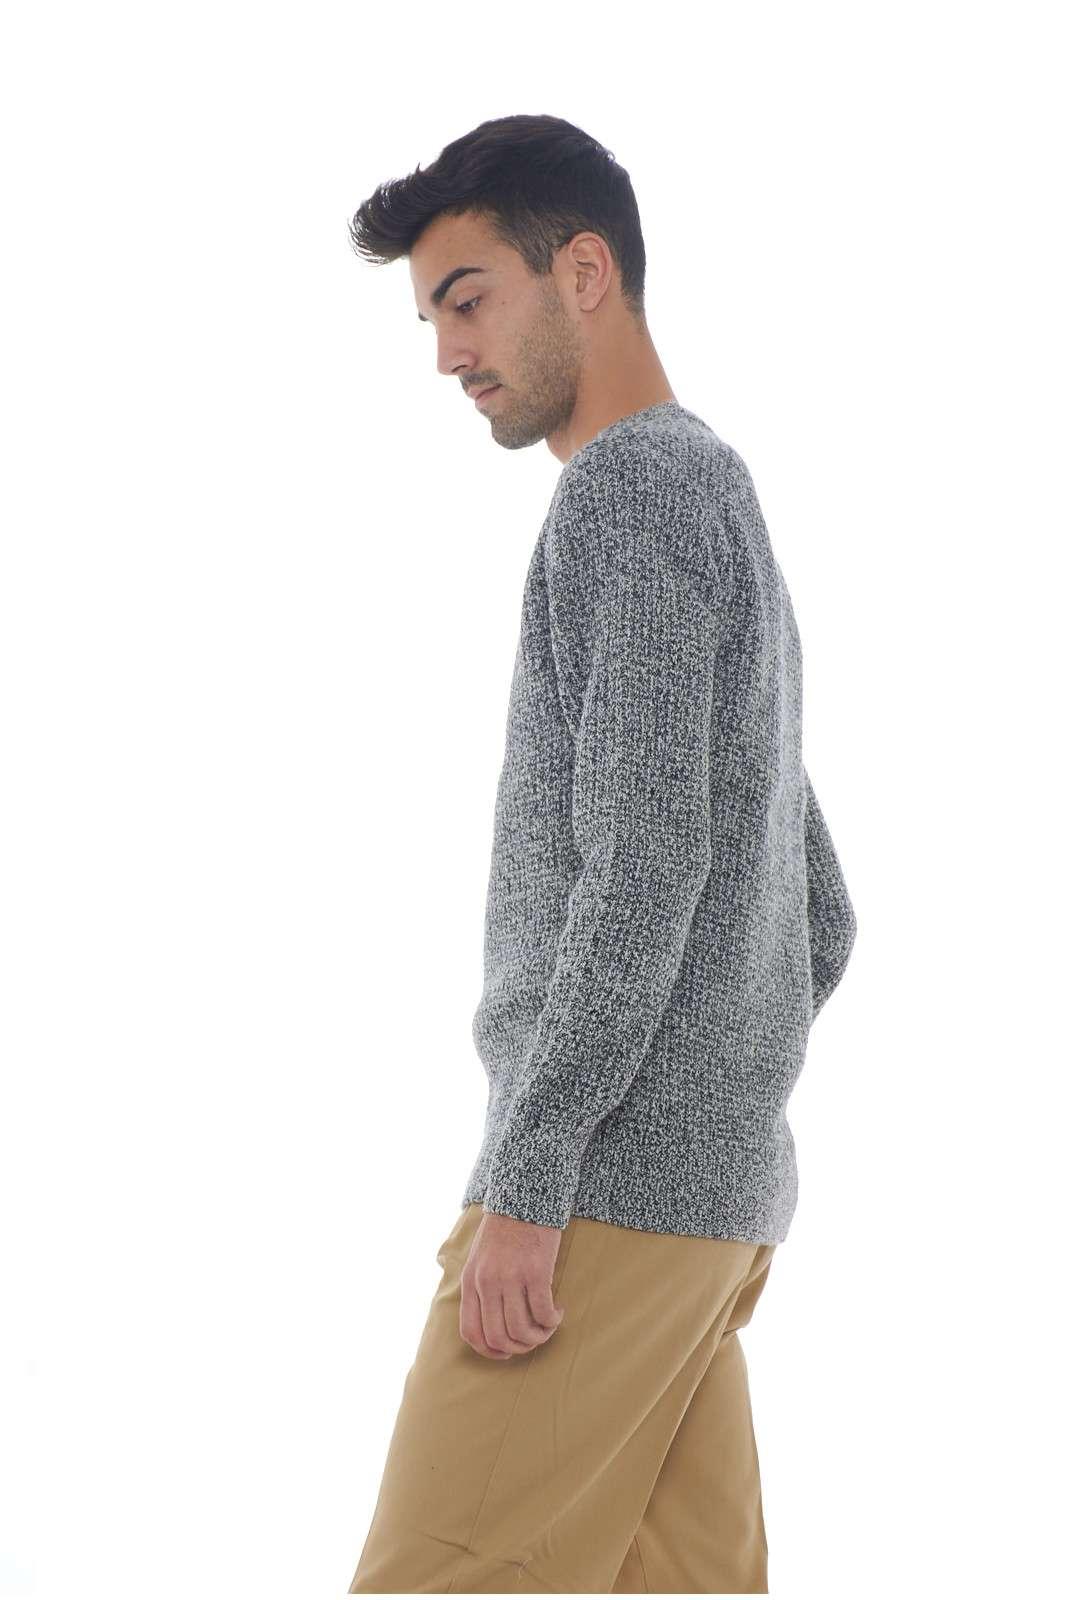 https://www.parmax.com/media/catalog/product/a/i/AI-outlet_parmax-maglia-uomo-Calvin-Klein-K10K104582-B.jpg